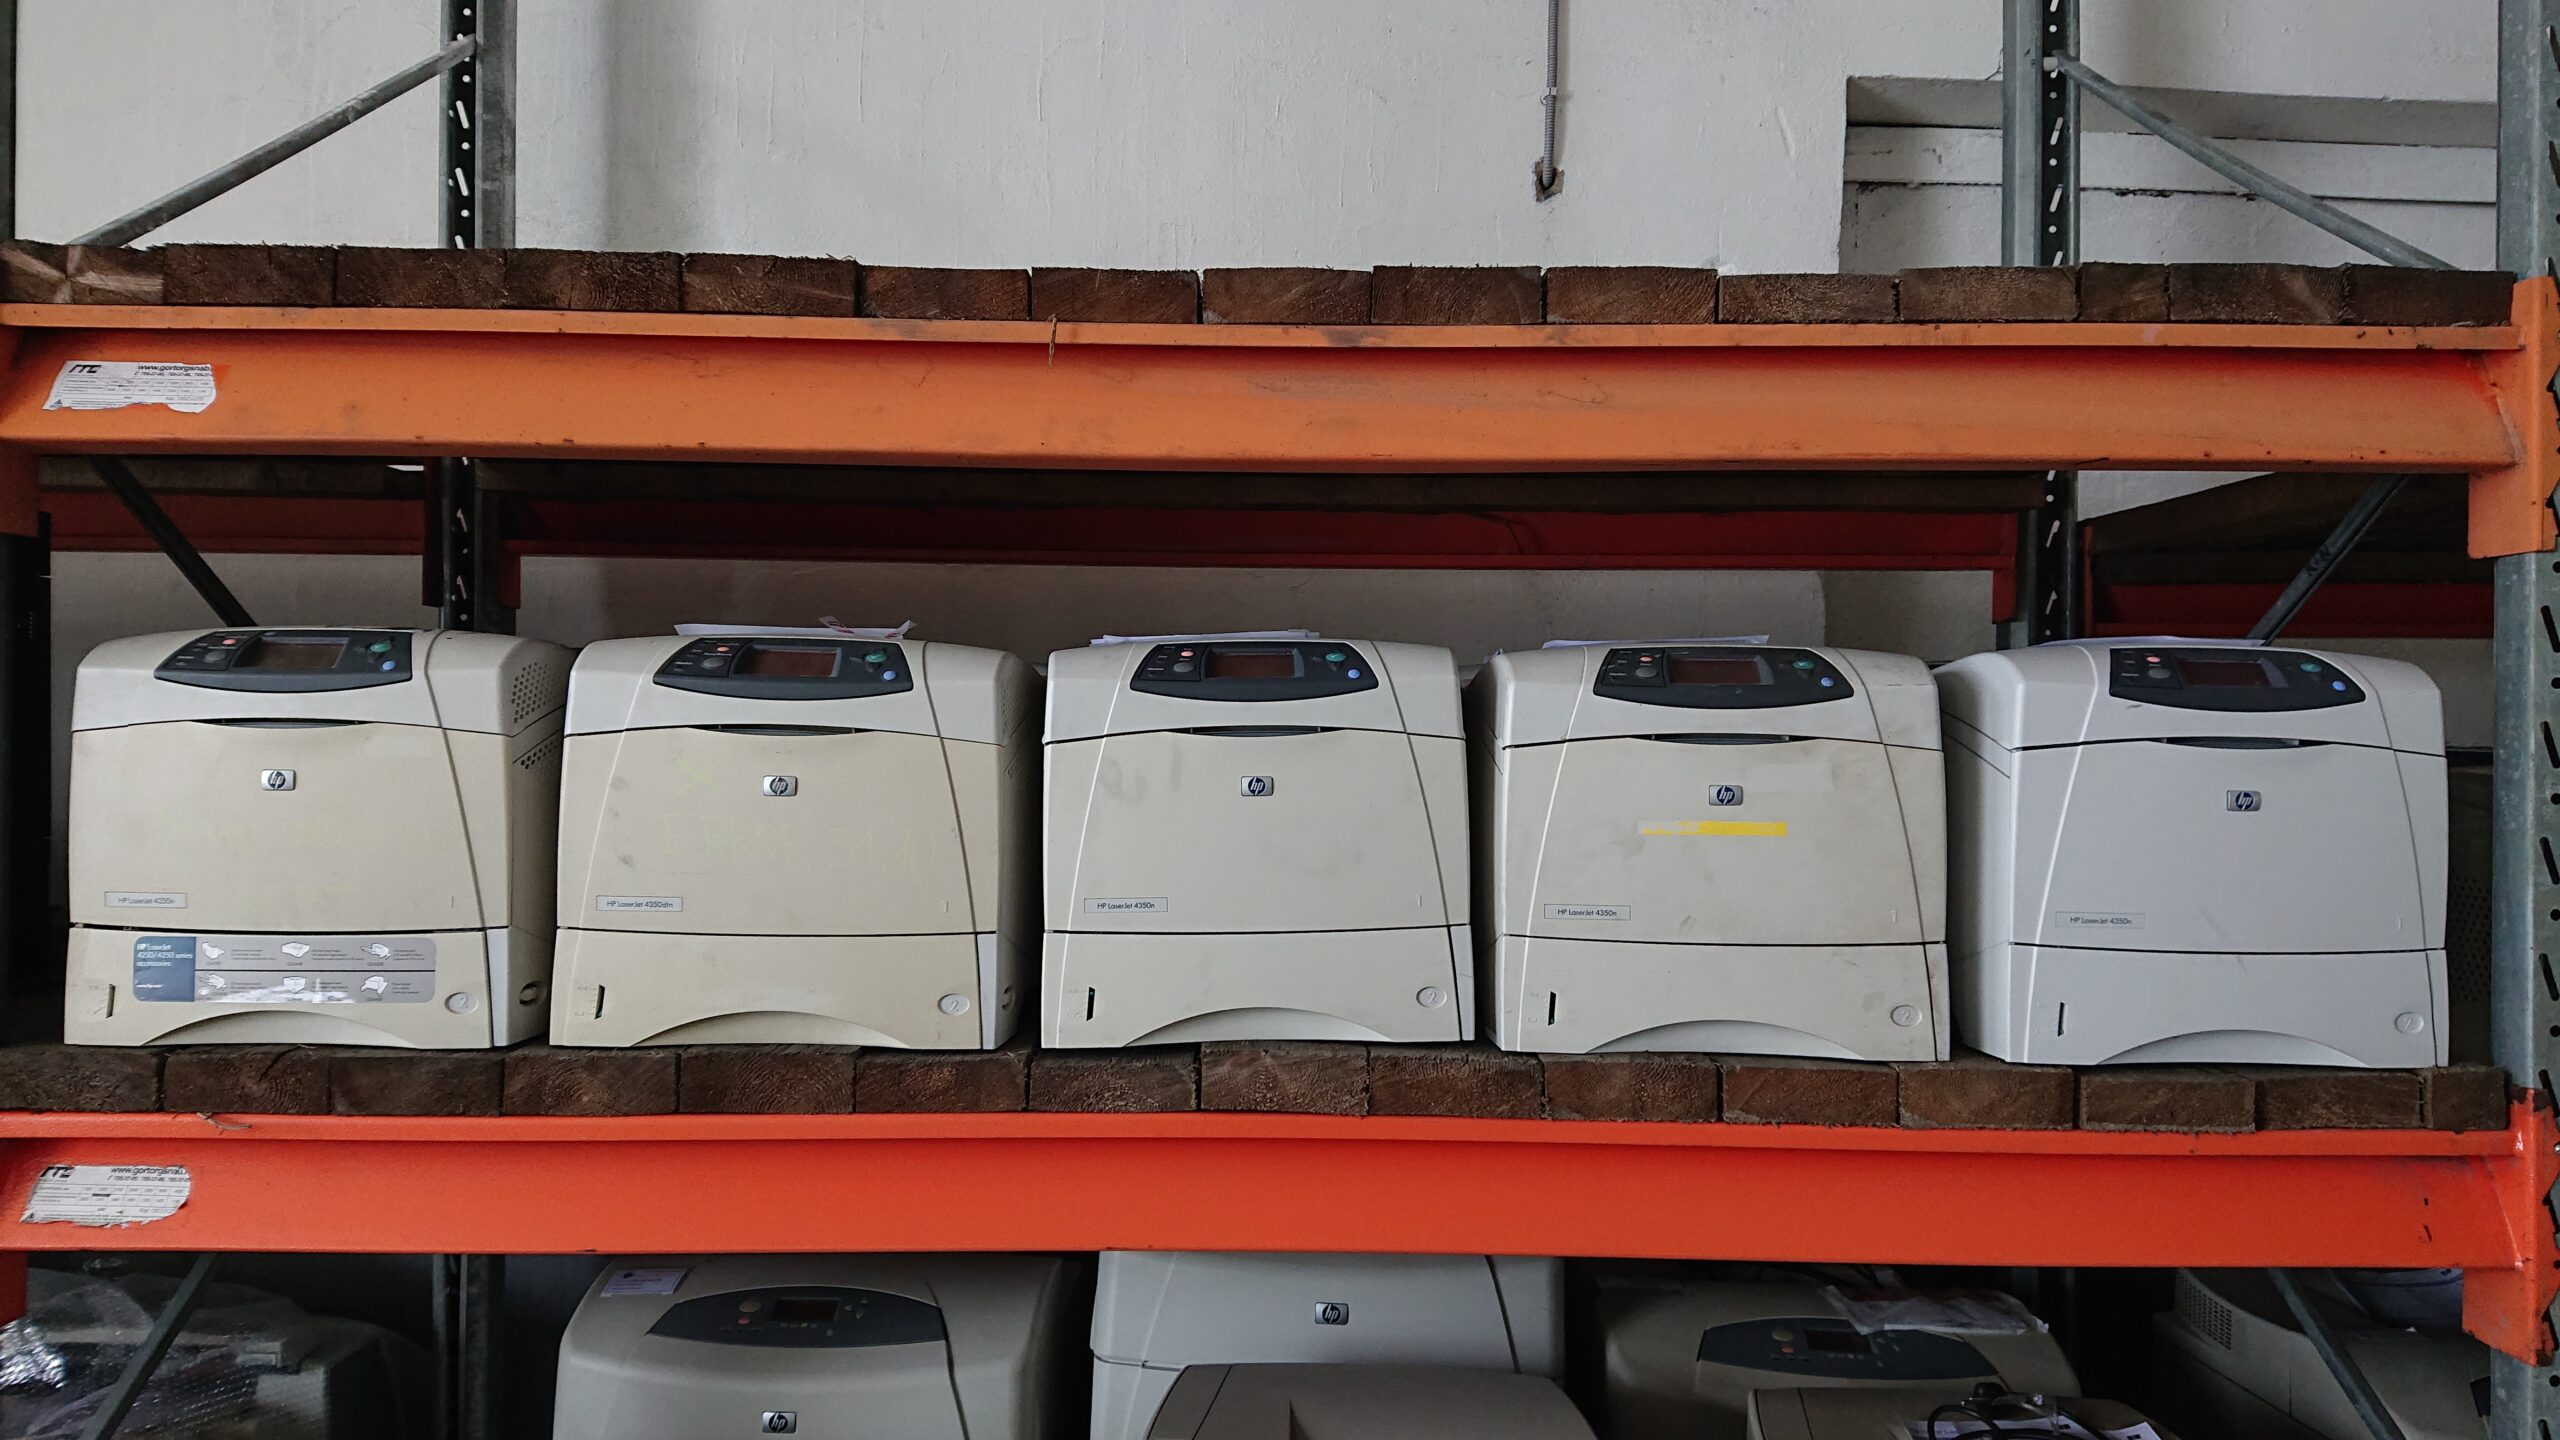 Принтеры HP LaserJet 4350, б\у (20-421-3)